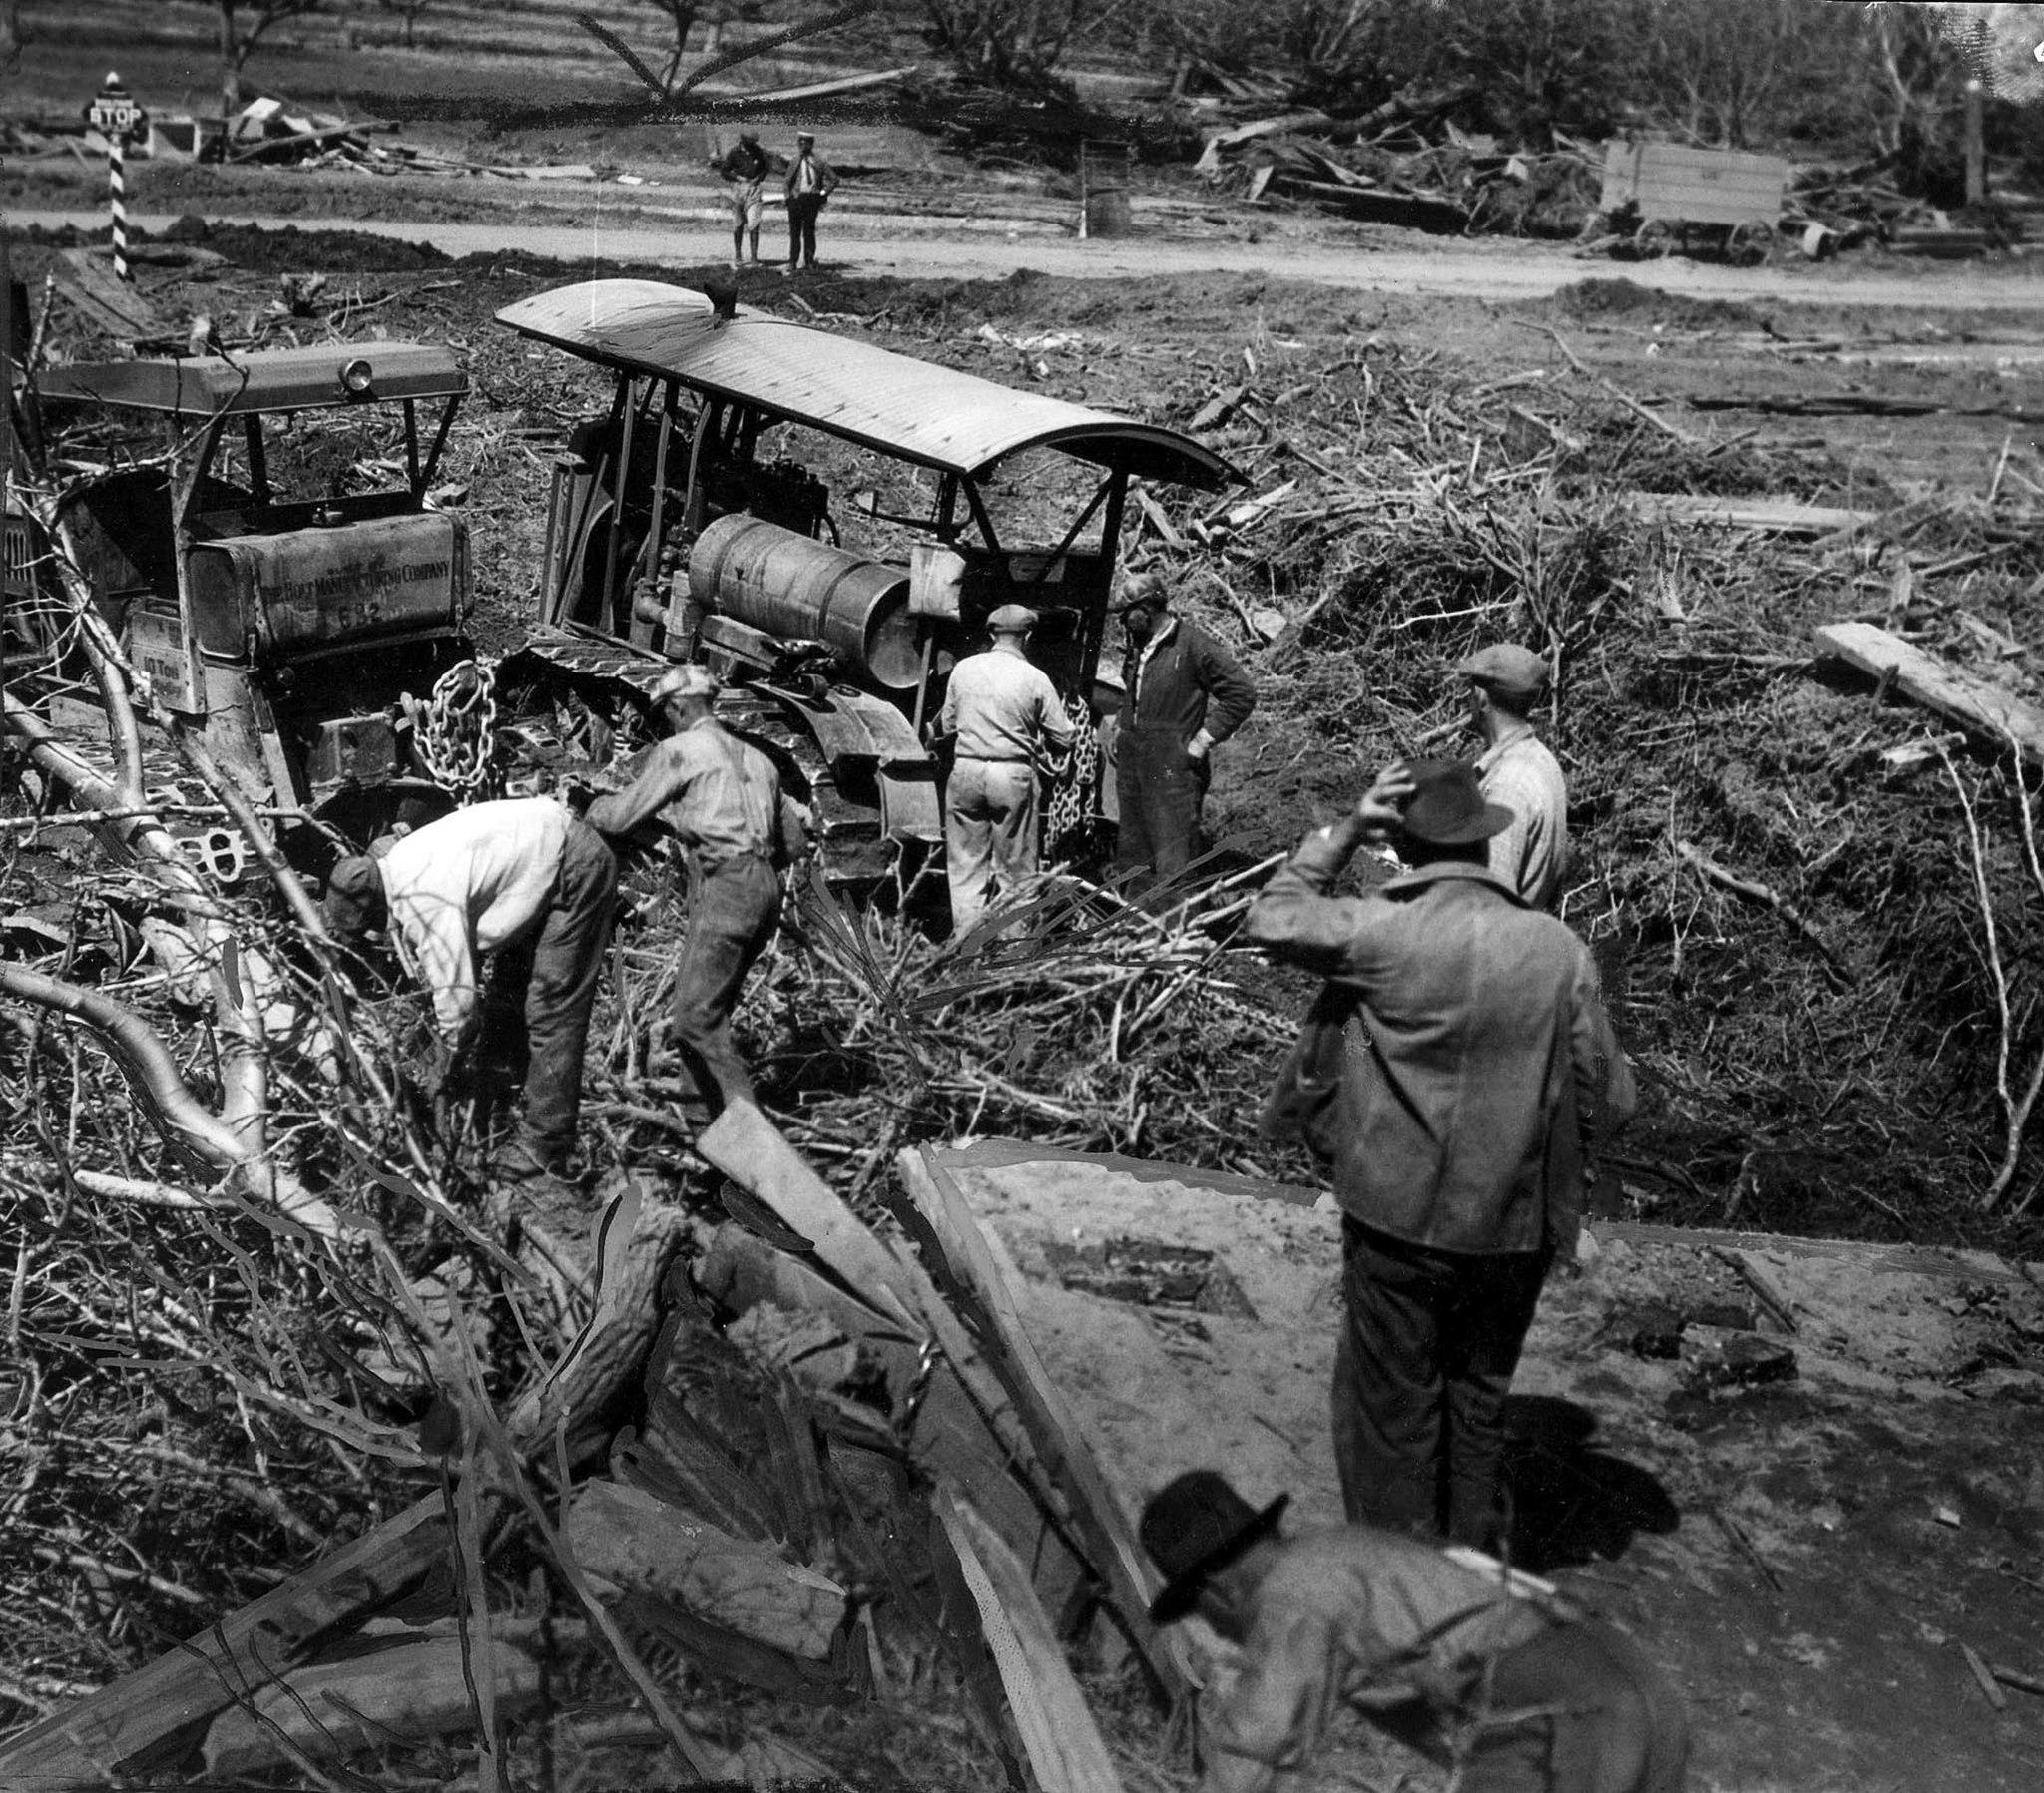 March 1928: Clearing away debris near Santa Paula following the St. Francis Dam disaster. This photo